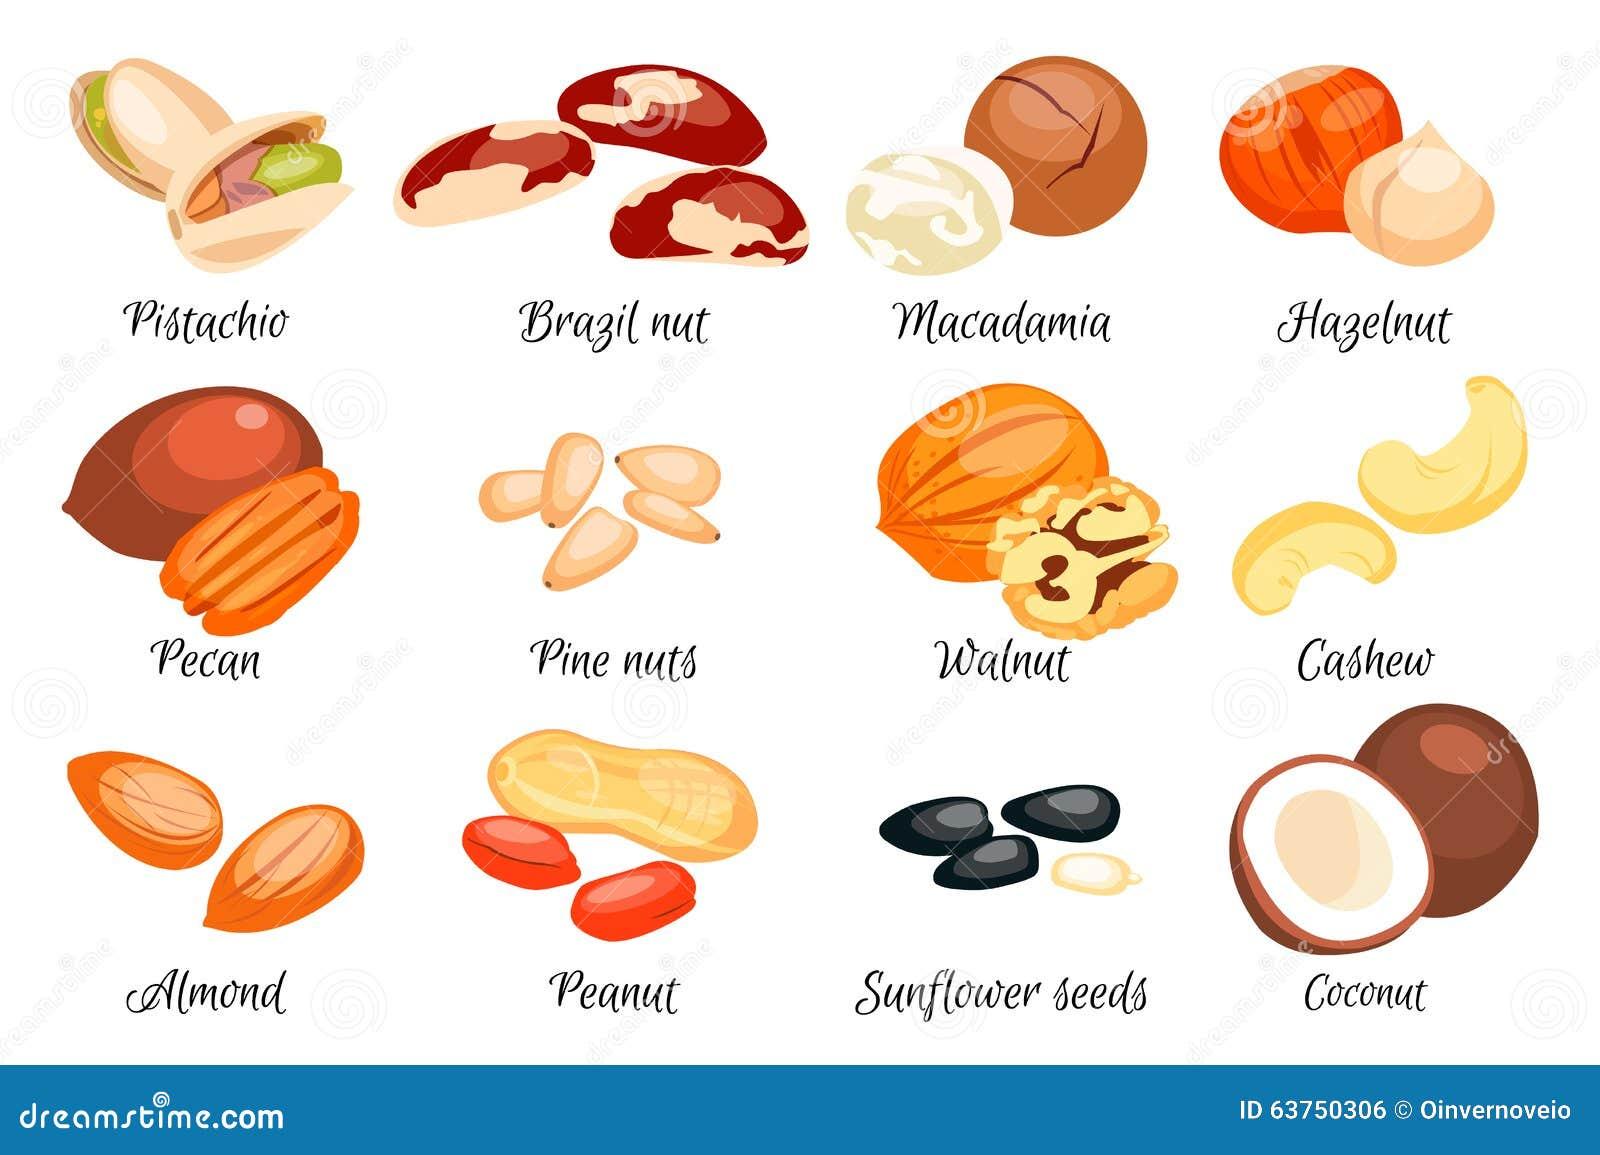 Nuts Set. Vector Illustration Stock Vector - Image: 63750306